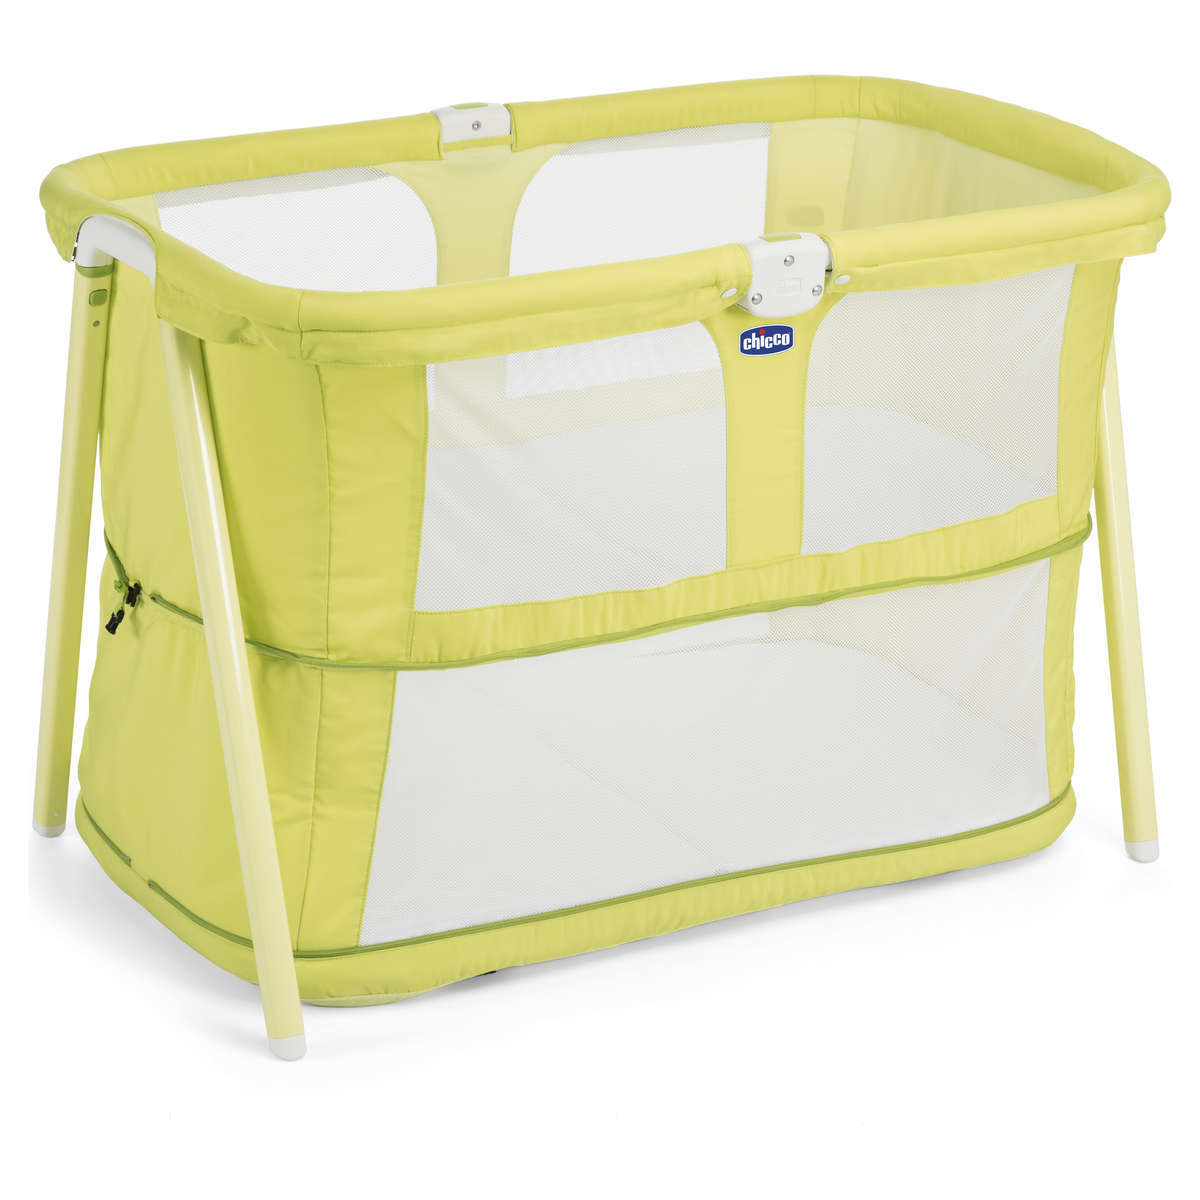 berceau lullago zip lemon drop 04079153400000 achat. Black Bedroom Furniture Sets. Home Design Ideas